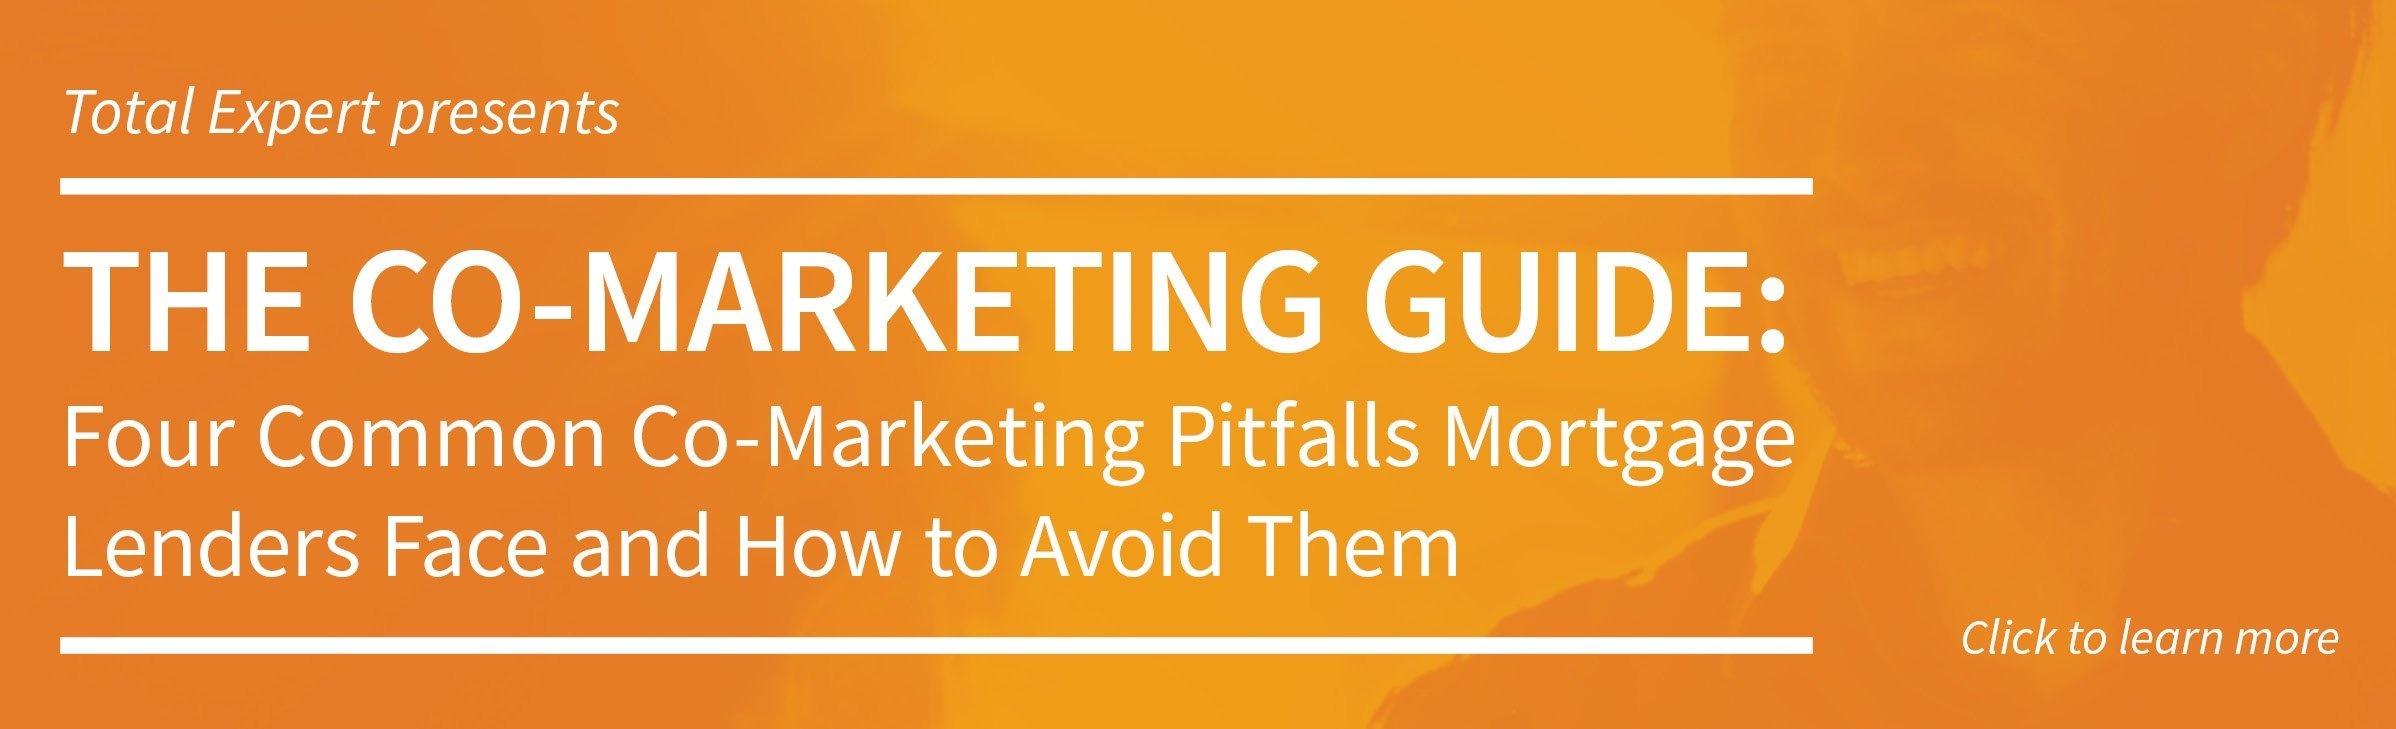 Co-Marketing Guide